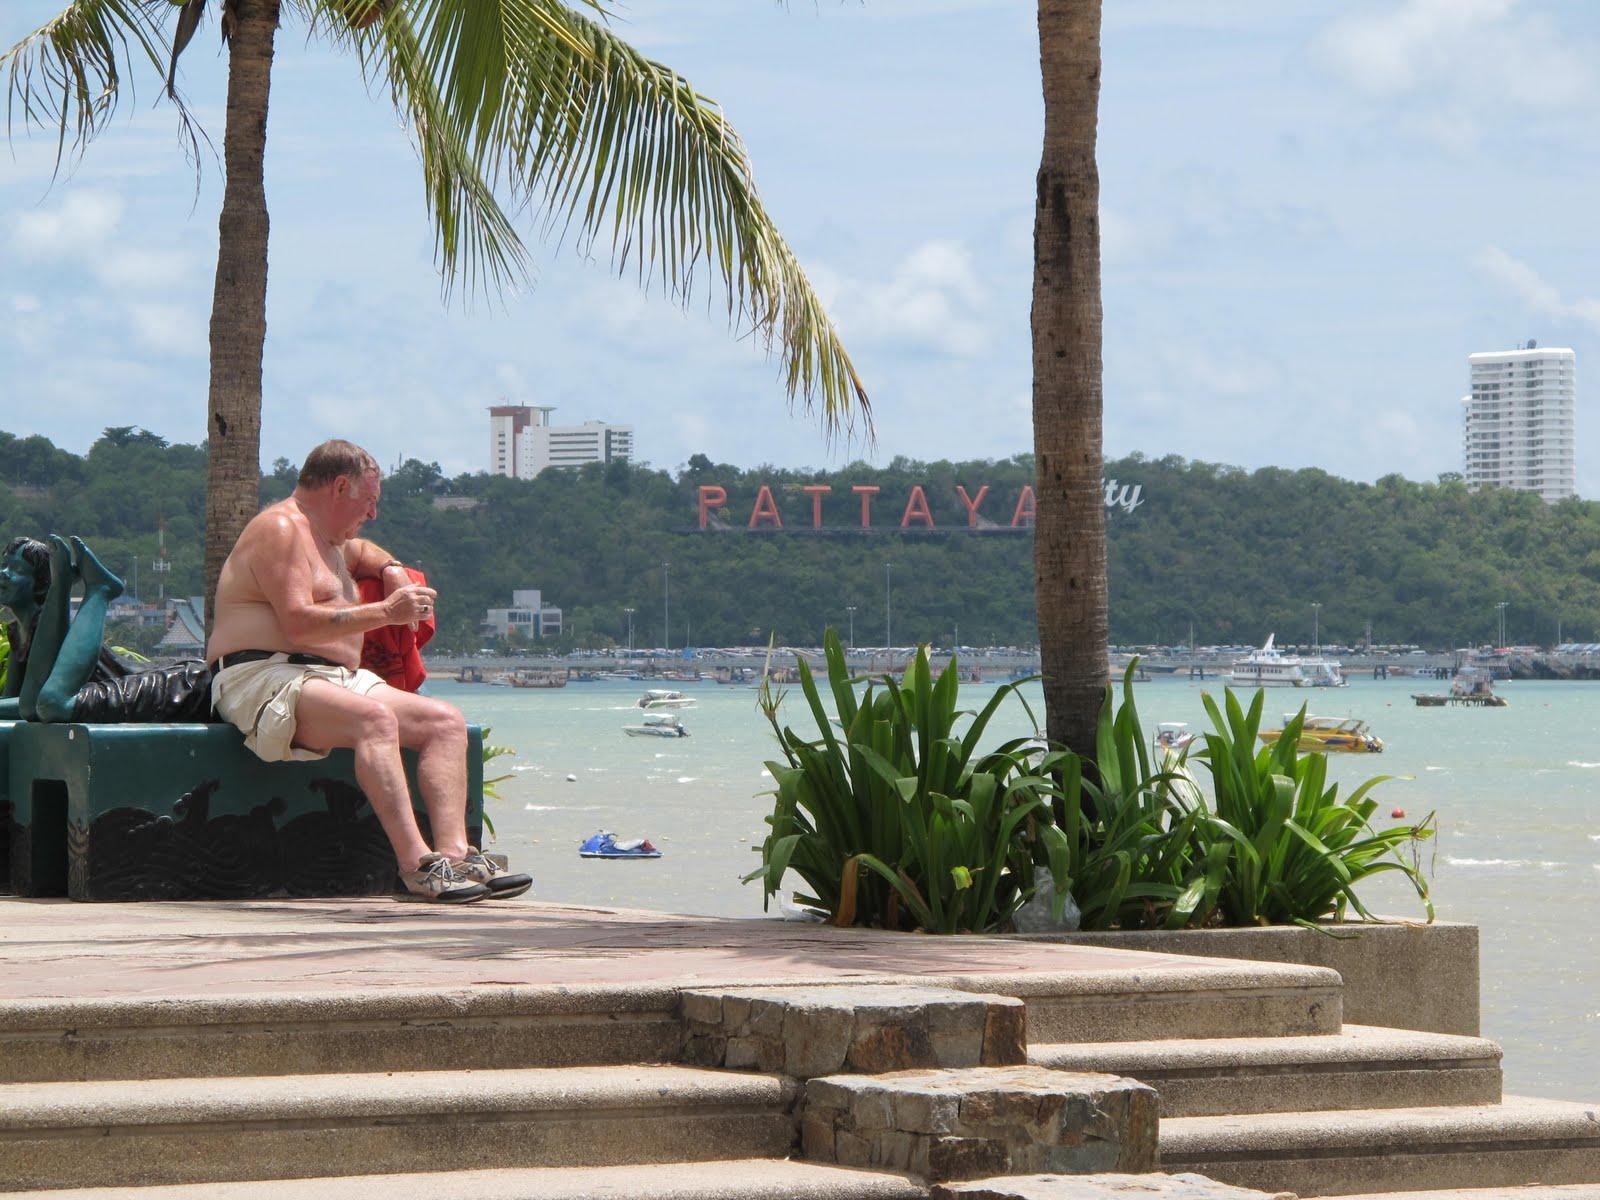 Pattaya old men sex tourists